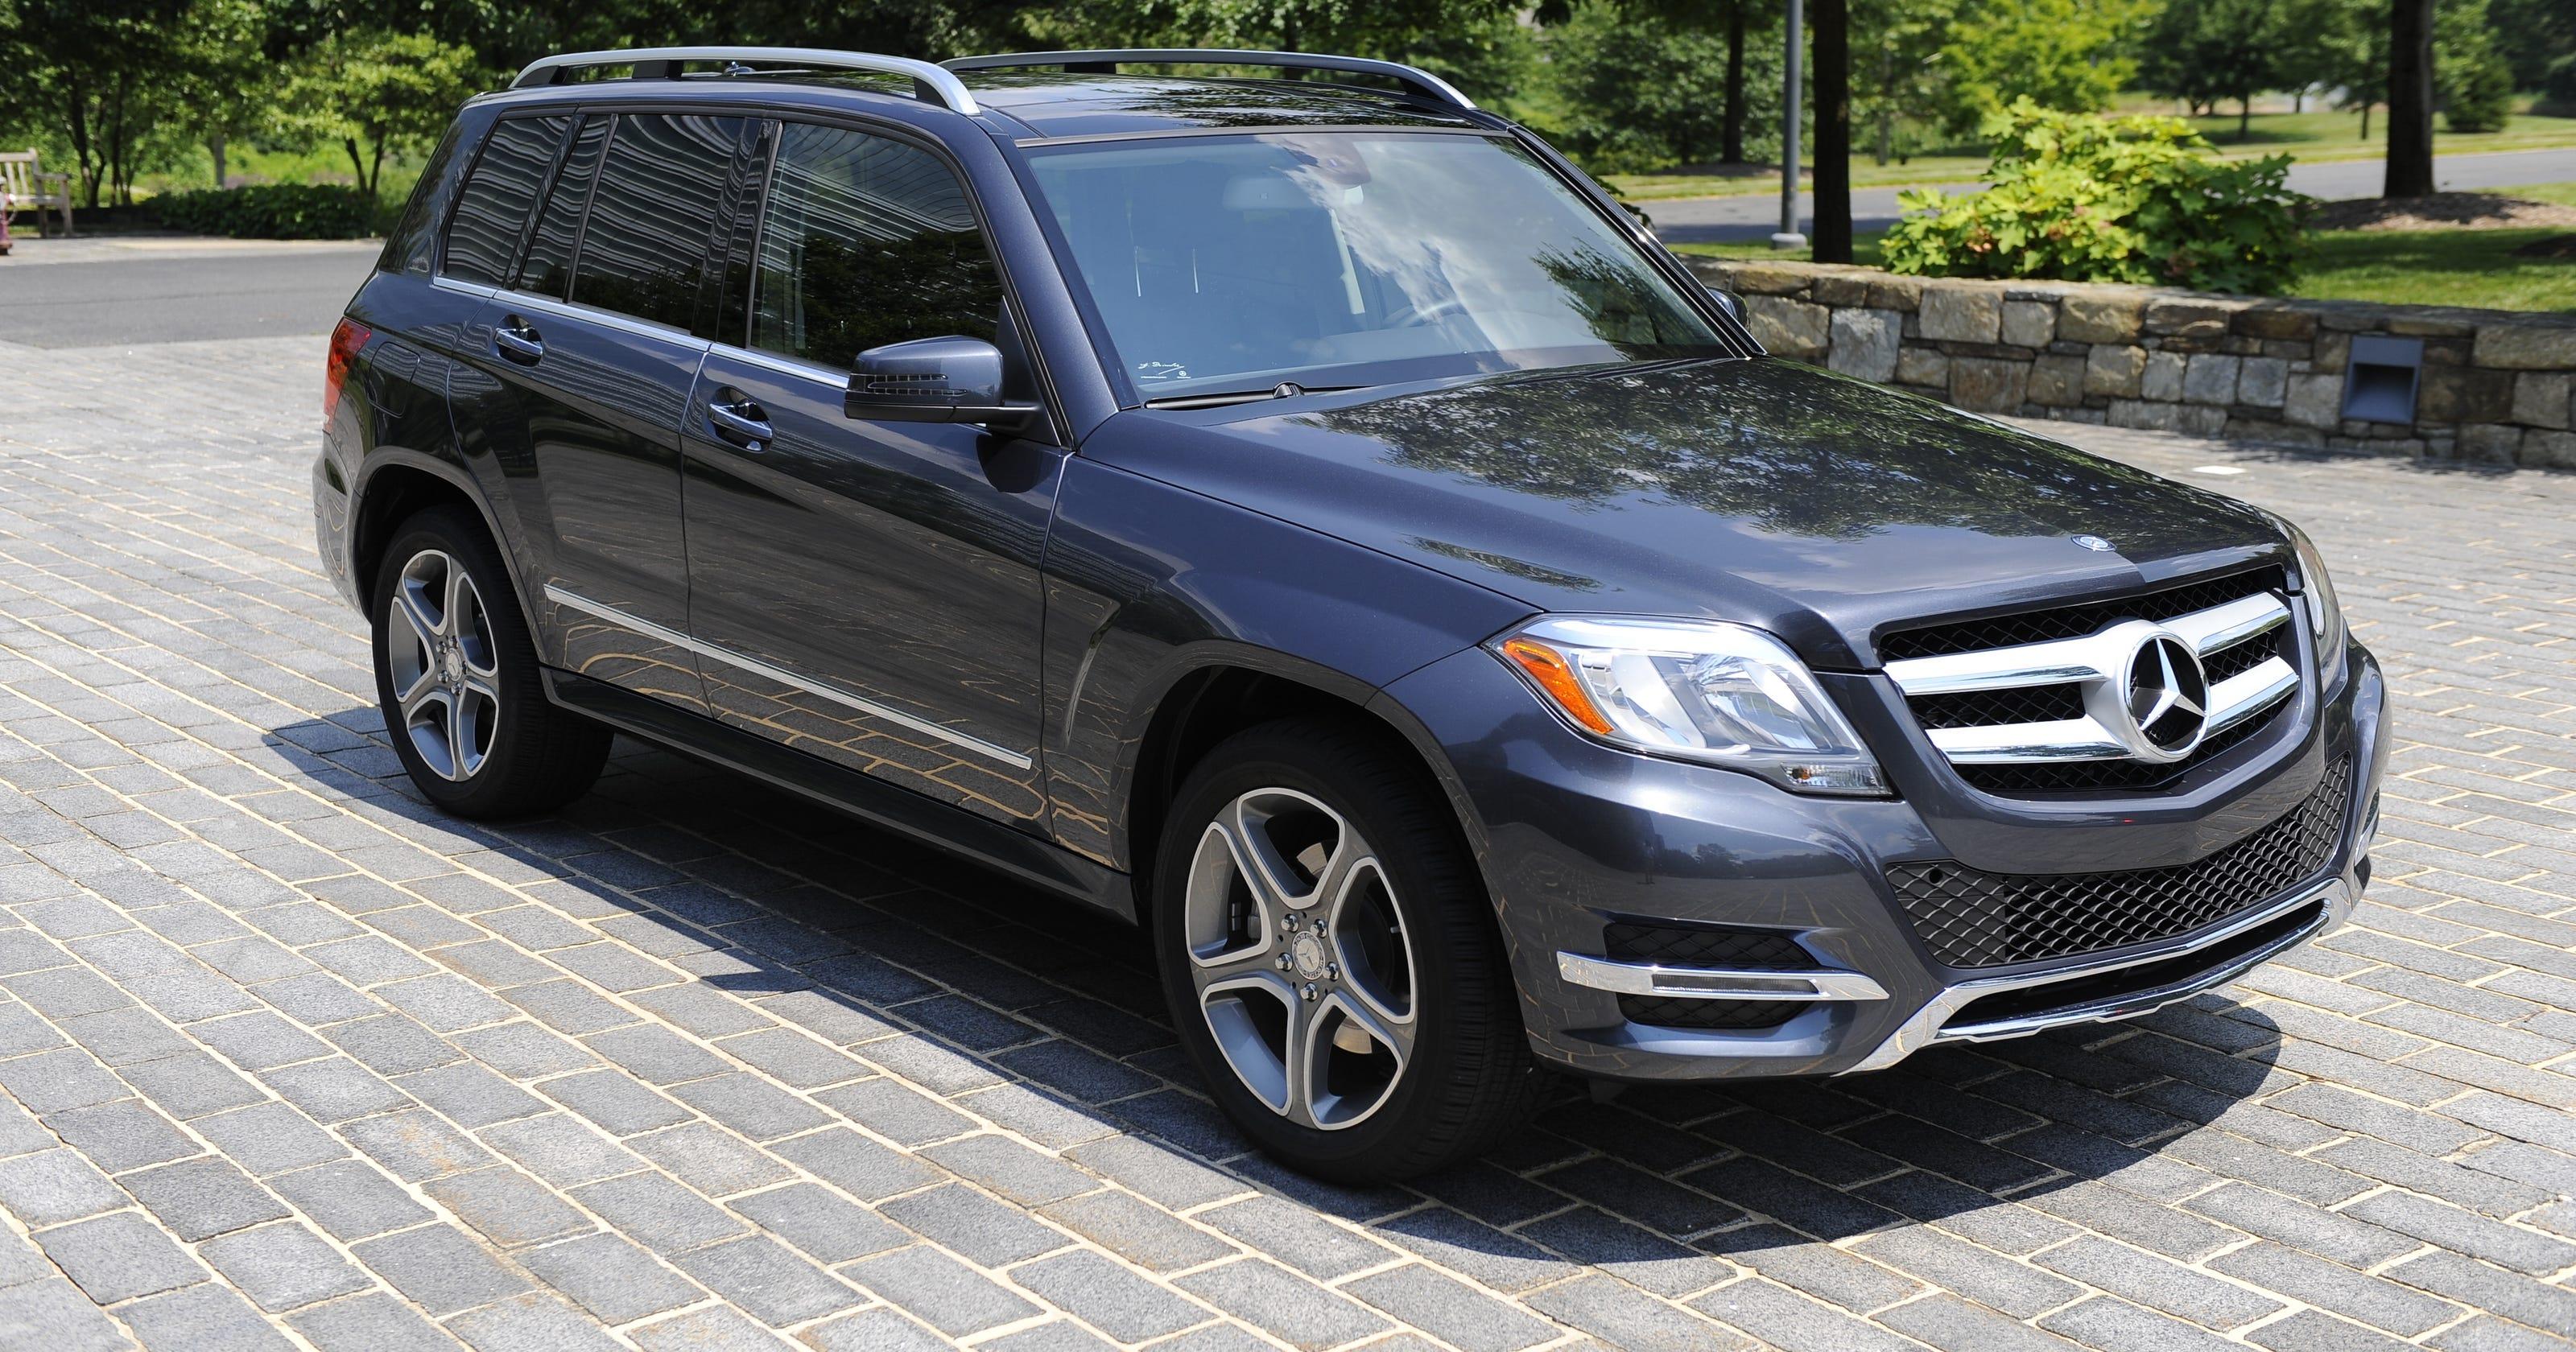 Test Drive: Mercedes-Benz GLK250 a great diesel